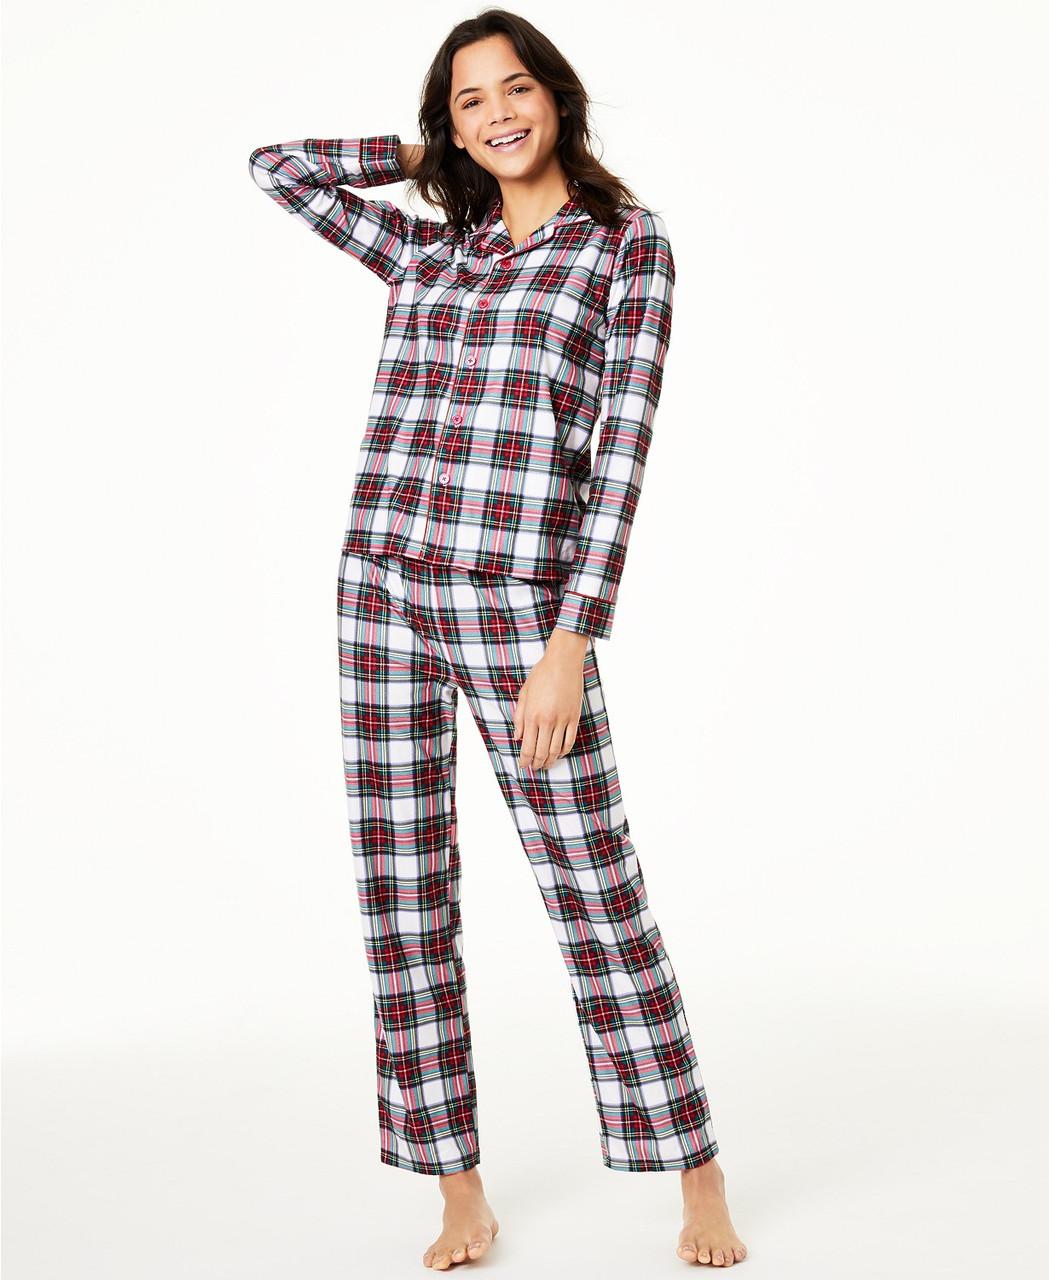 Family Pajamas Женская пижама - Е2